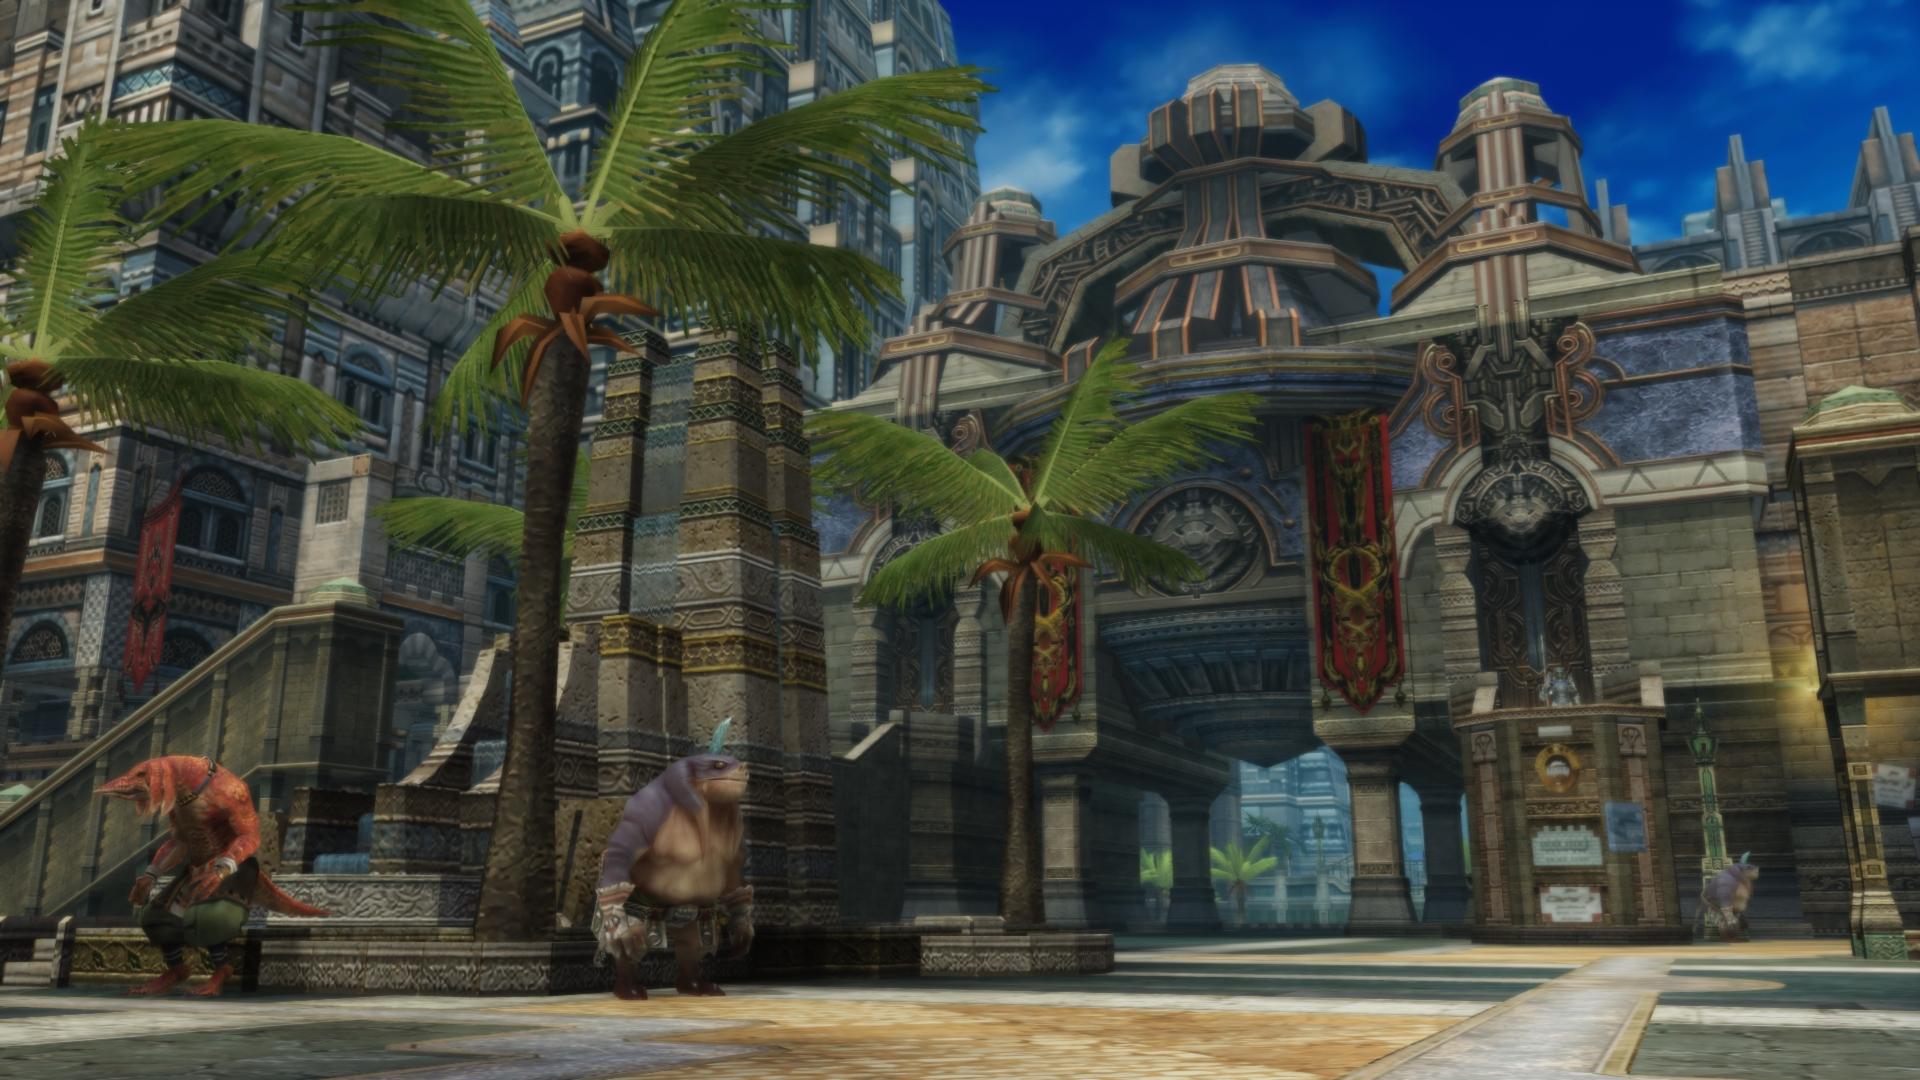 Final Fantasy Xii The Zodiac Age Screen 6